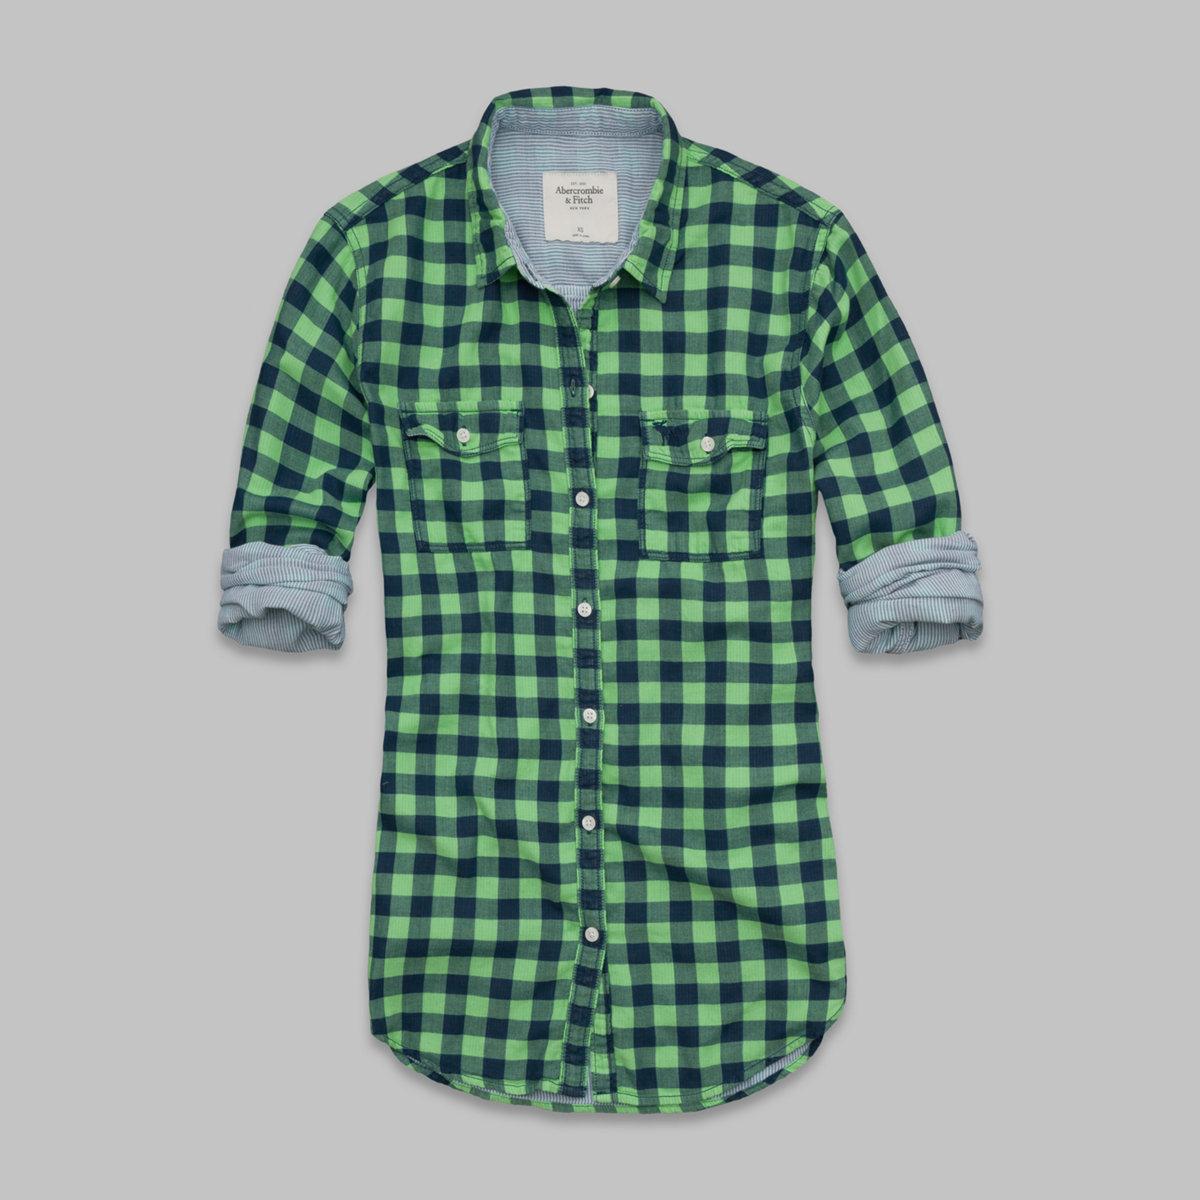 Marlie Shirt